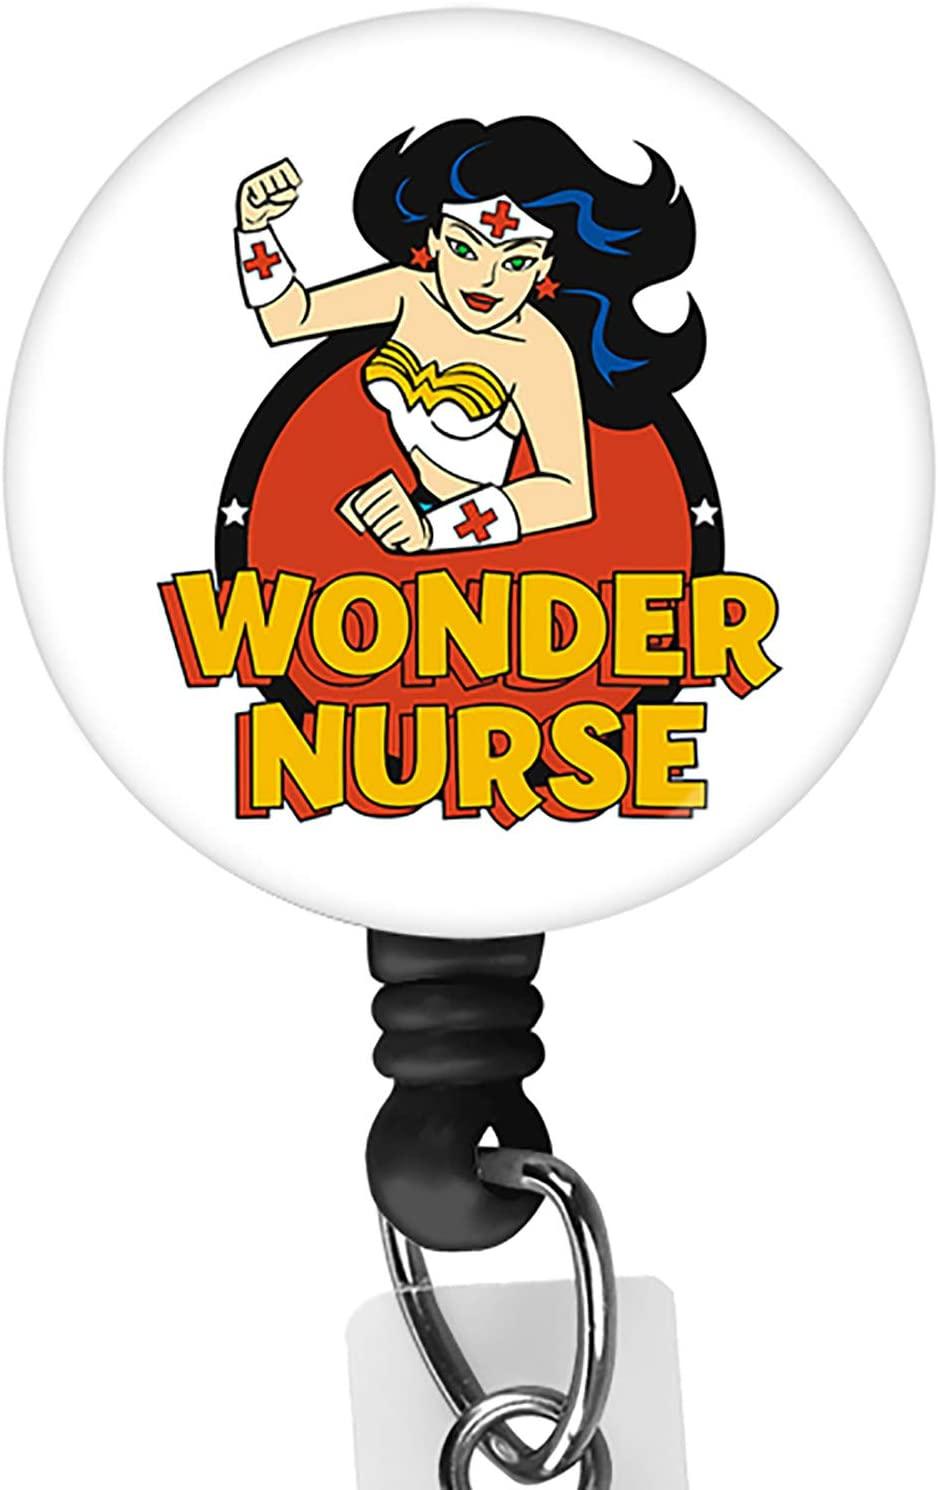 Wonder Nurse Retractable ID Card Badge Holder with Alligator Clip, Name Nurse Decorative Badge Reel Clip on Card Holders